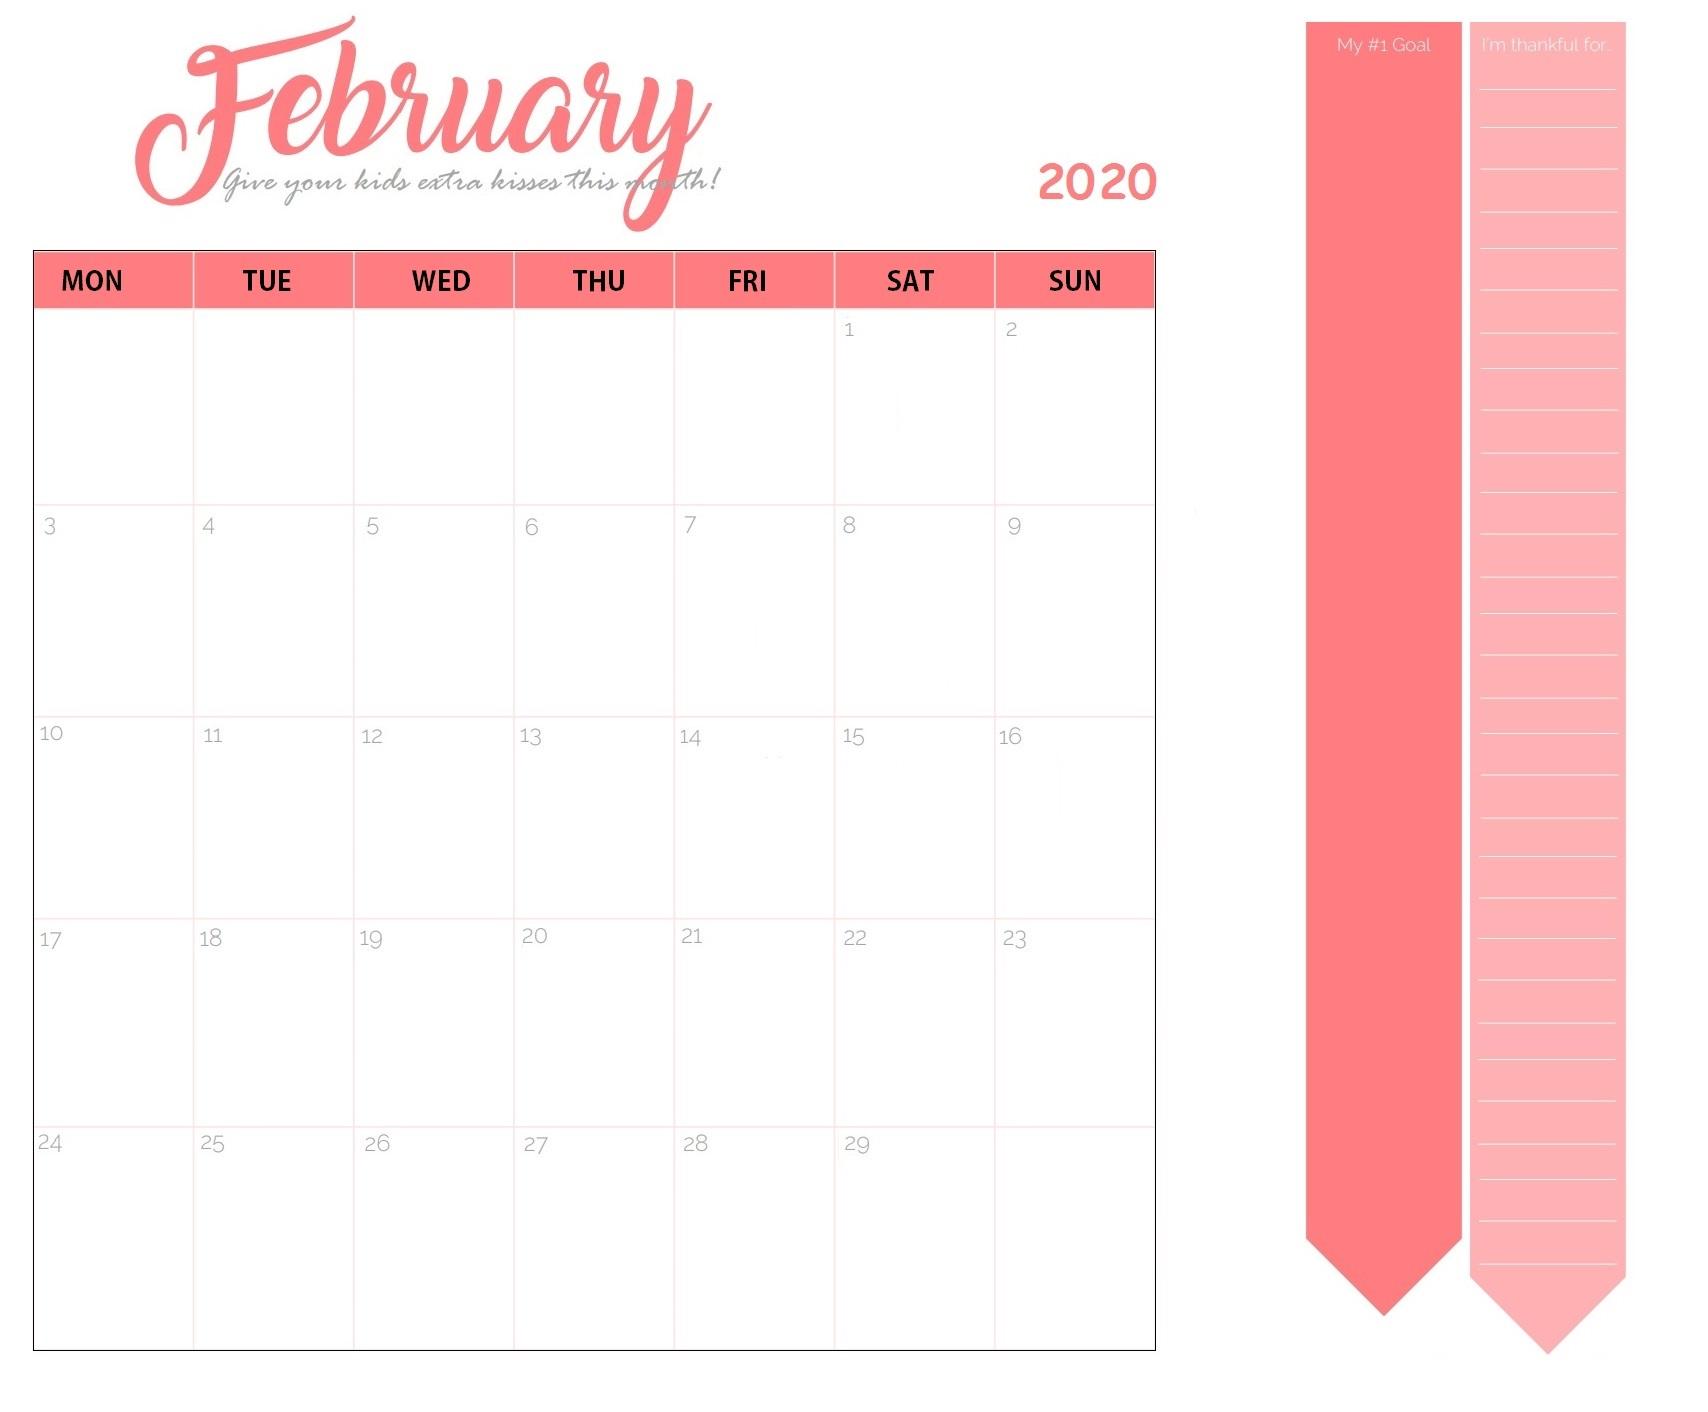 Print February Calendar 2020